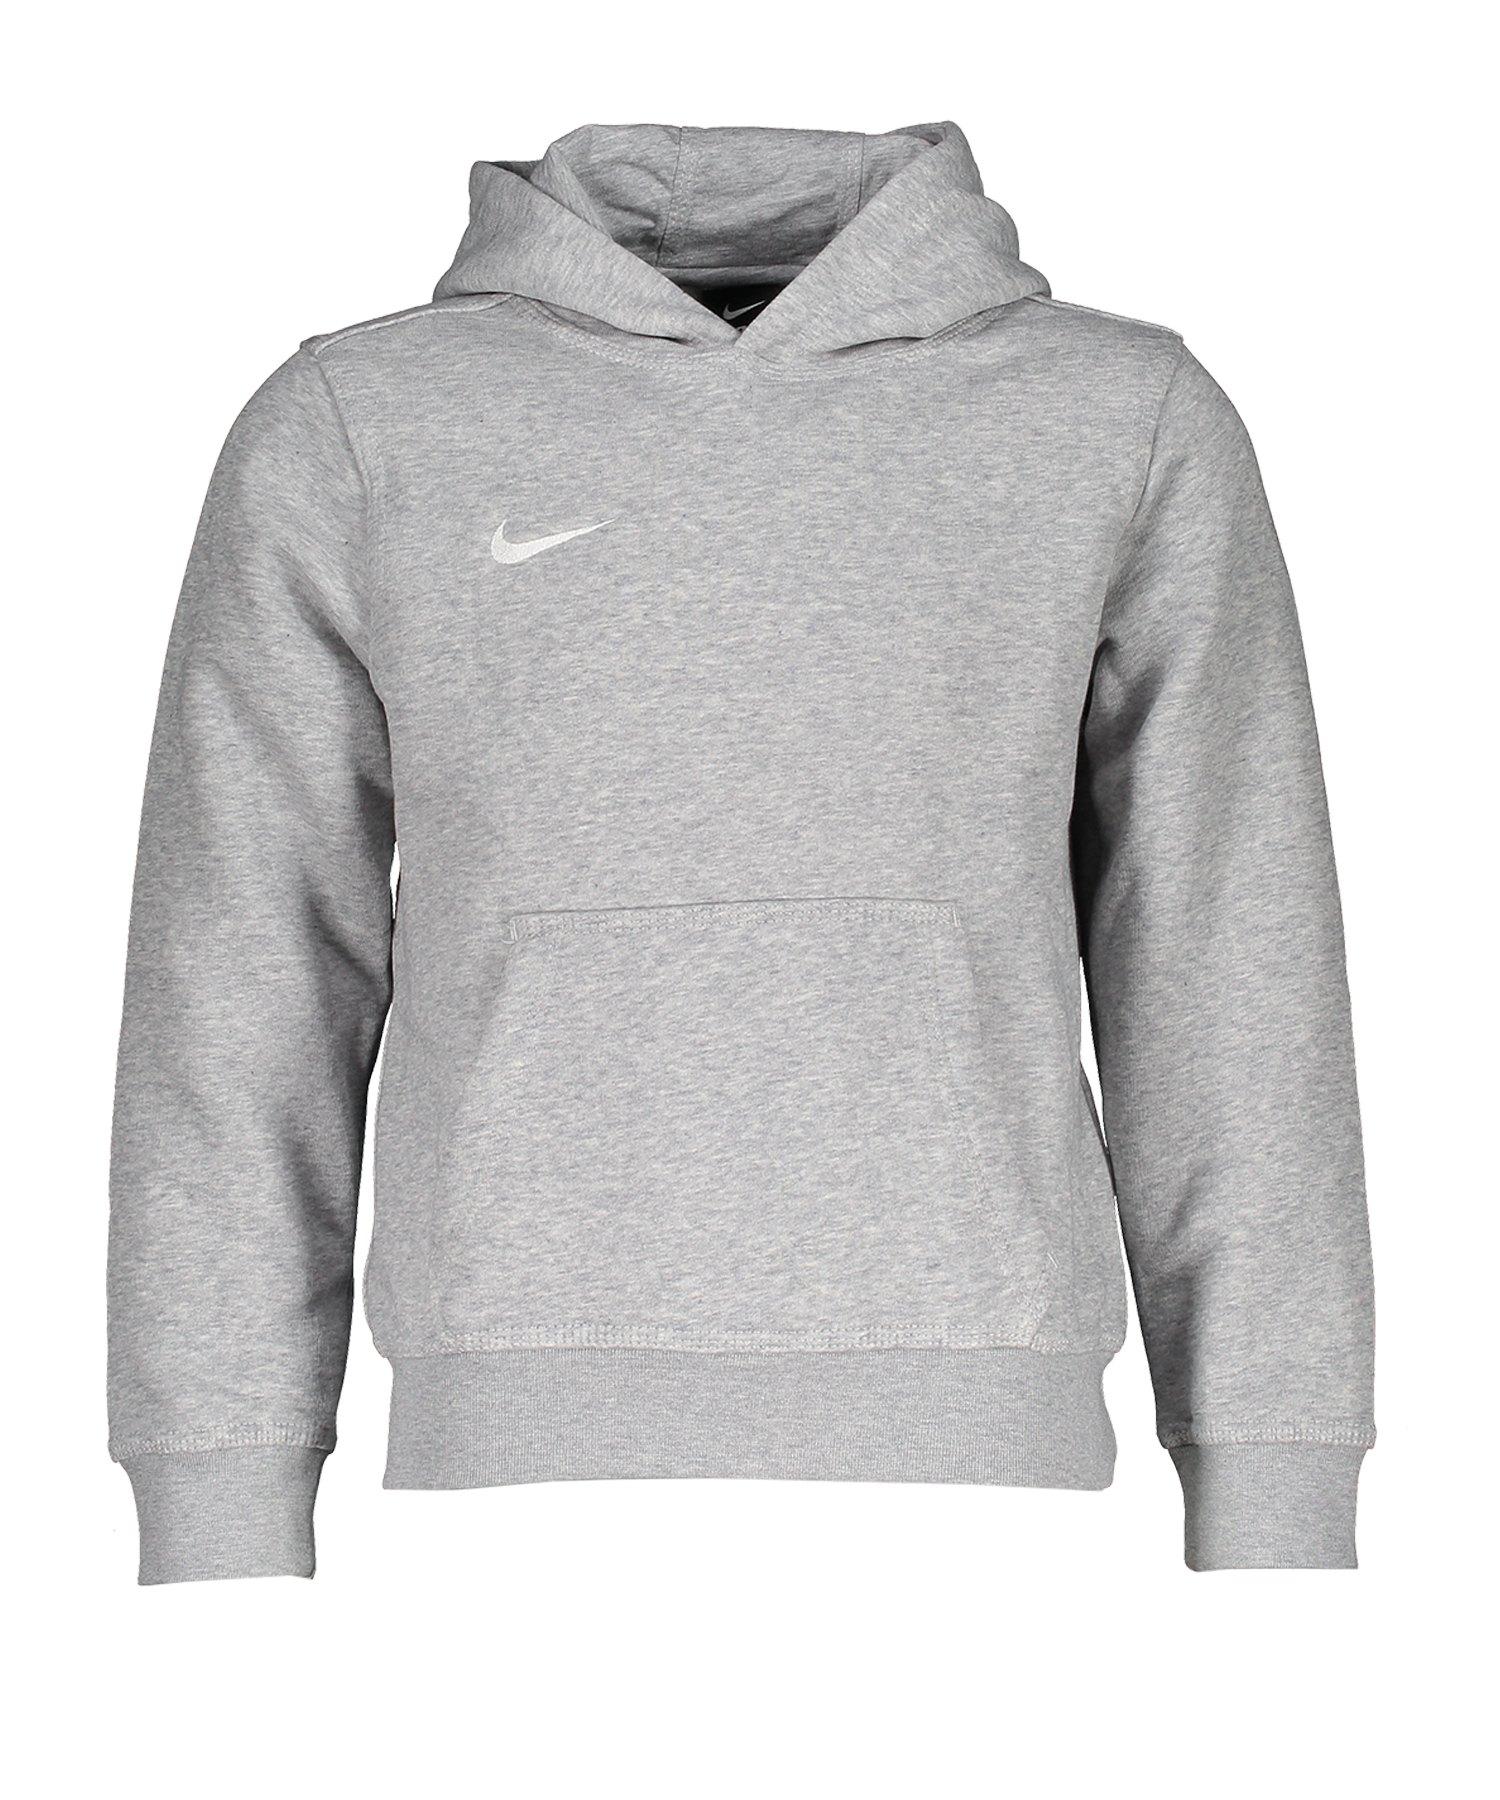 Nike Team Club Hoody Kids Grau F050 | Sweatshirt | Kapuzenpullover ...